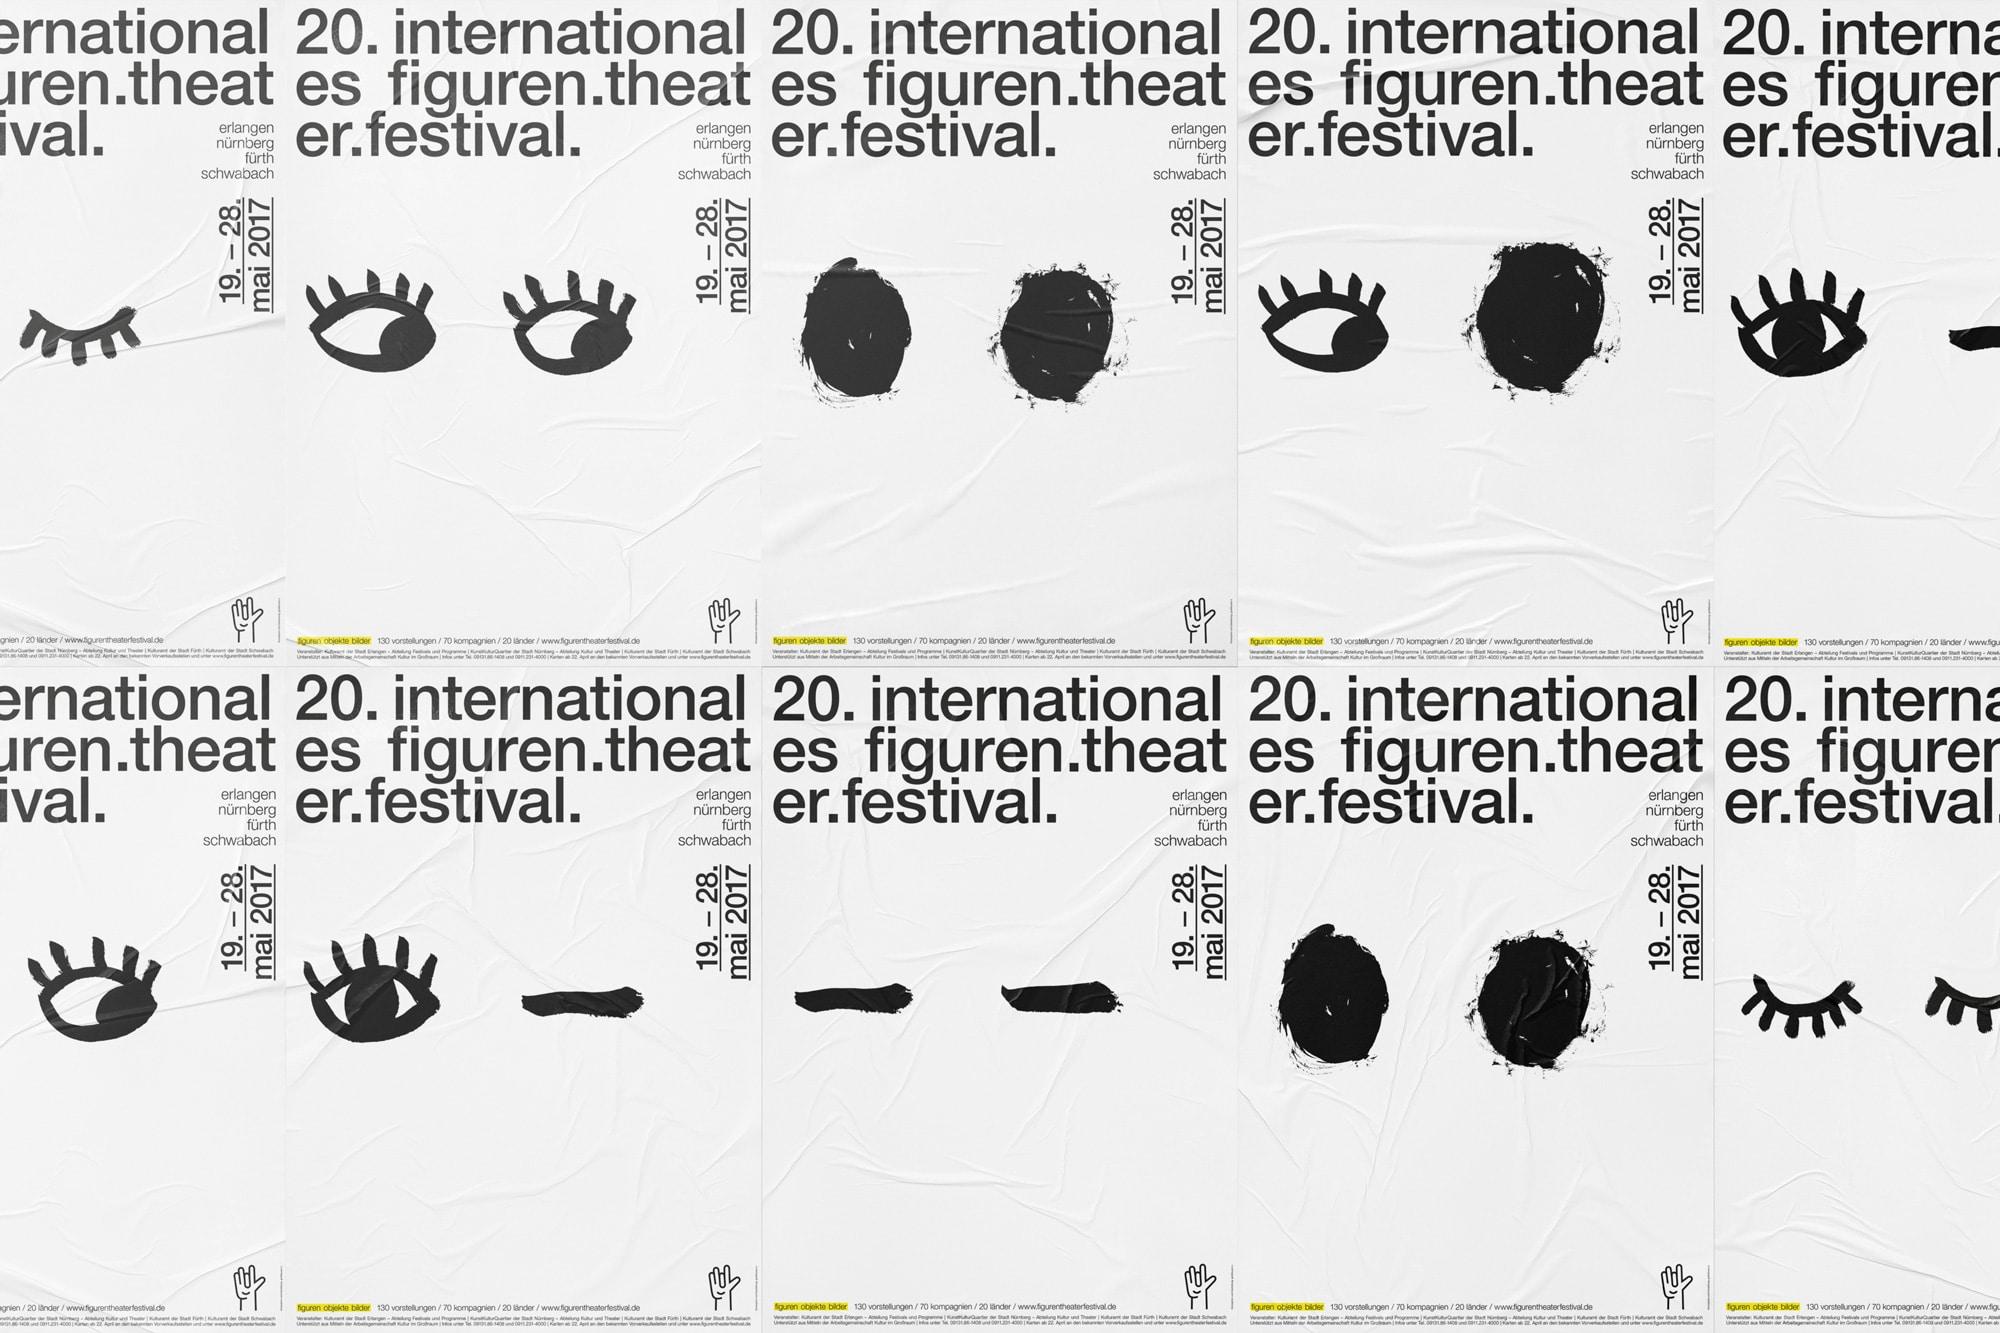 planx-internationales.figren.theater.festival-2017-6Plakate